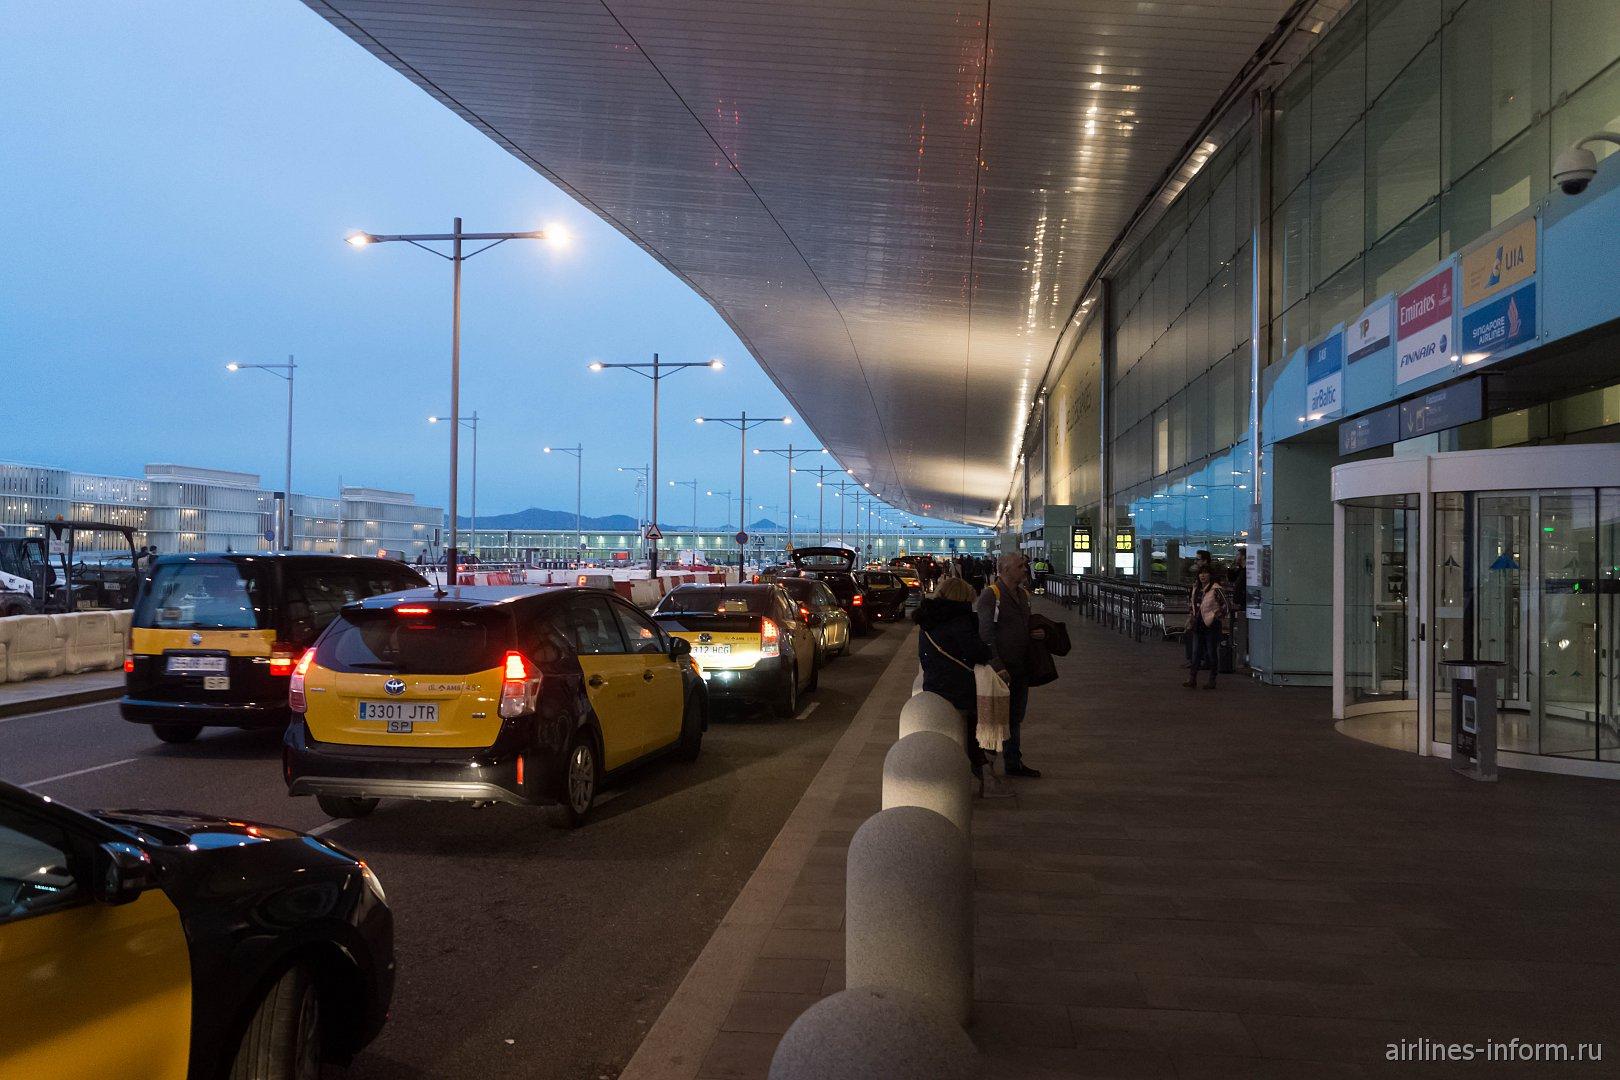 У входа в терминал T1 аэропорта Барселона Эль-Прат